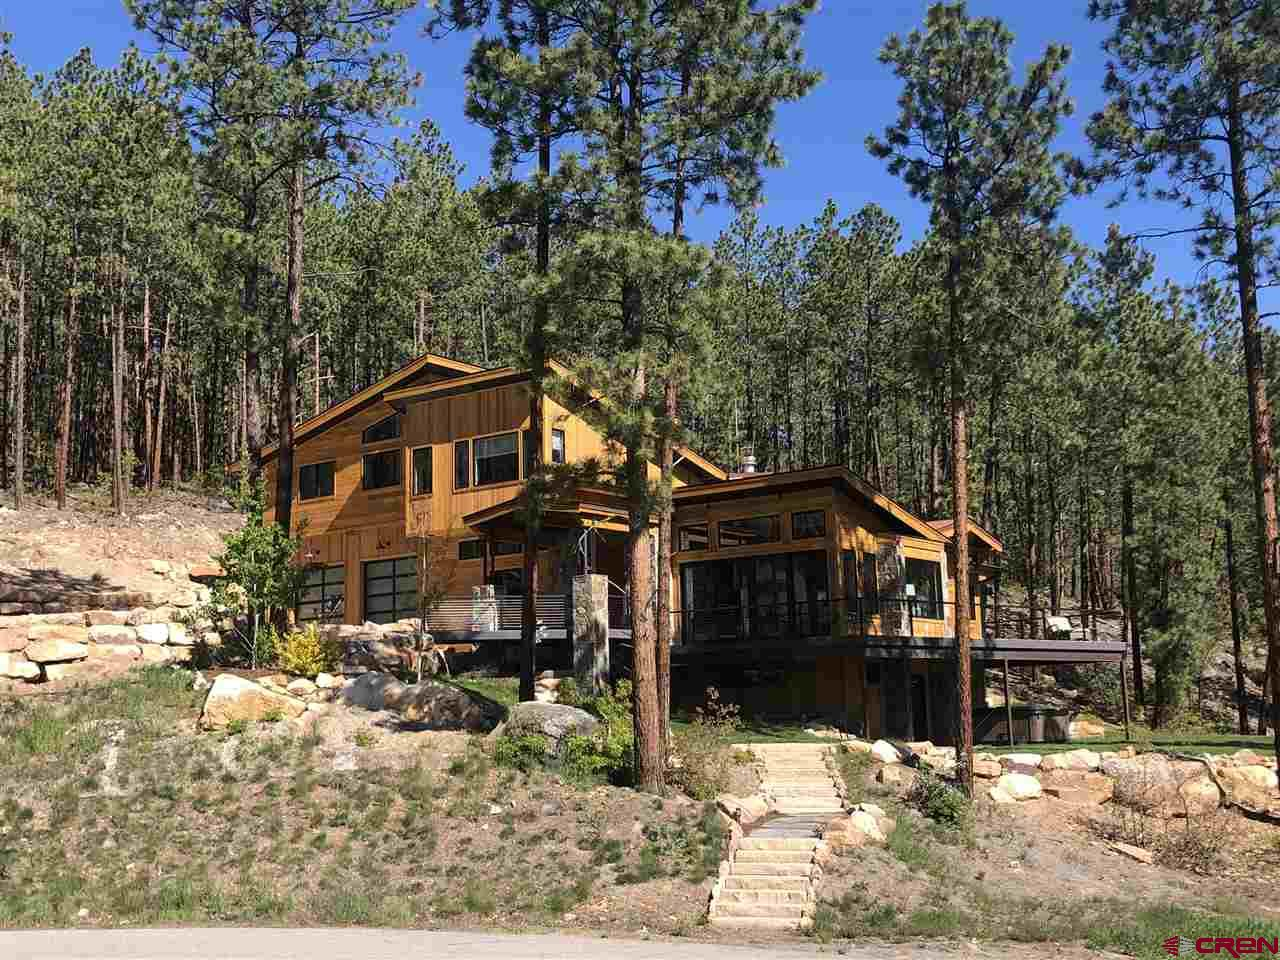 681 Monarch Crest Trail, Durango, CO 81301